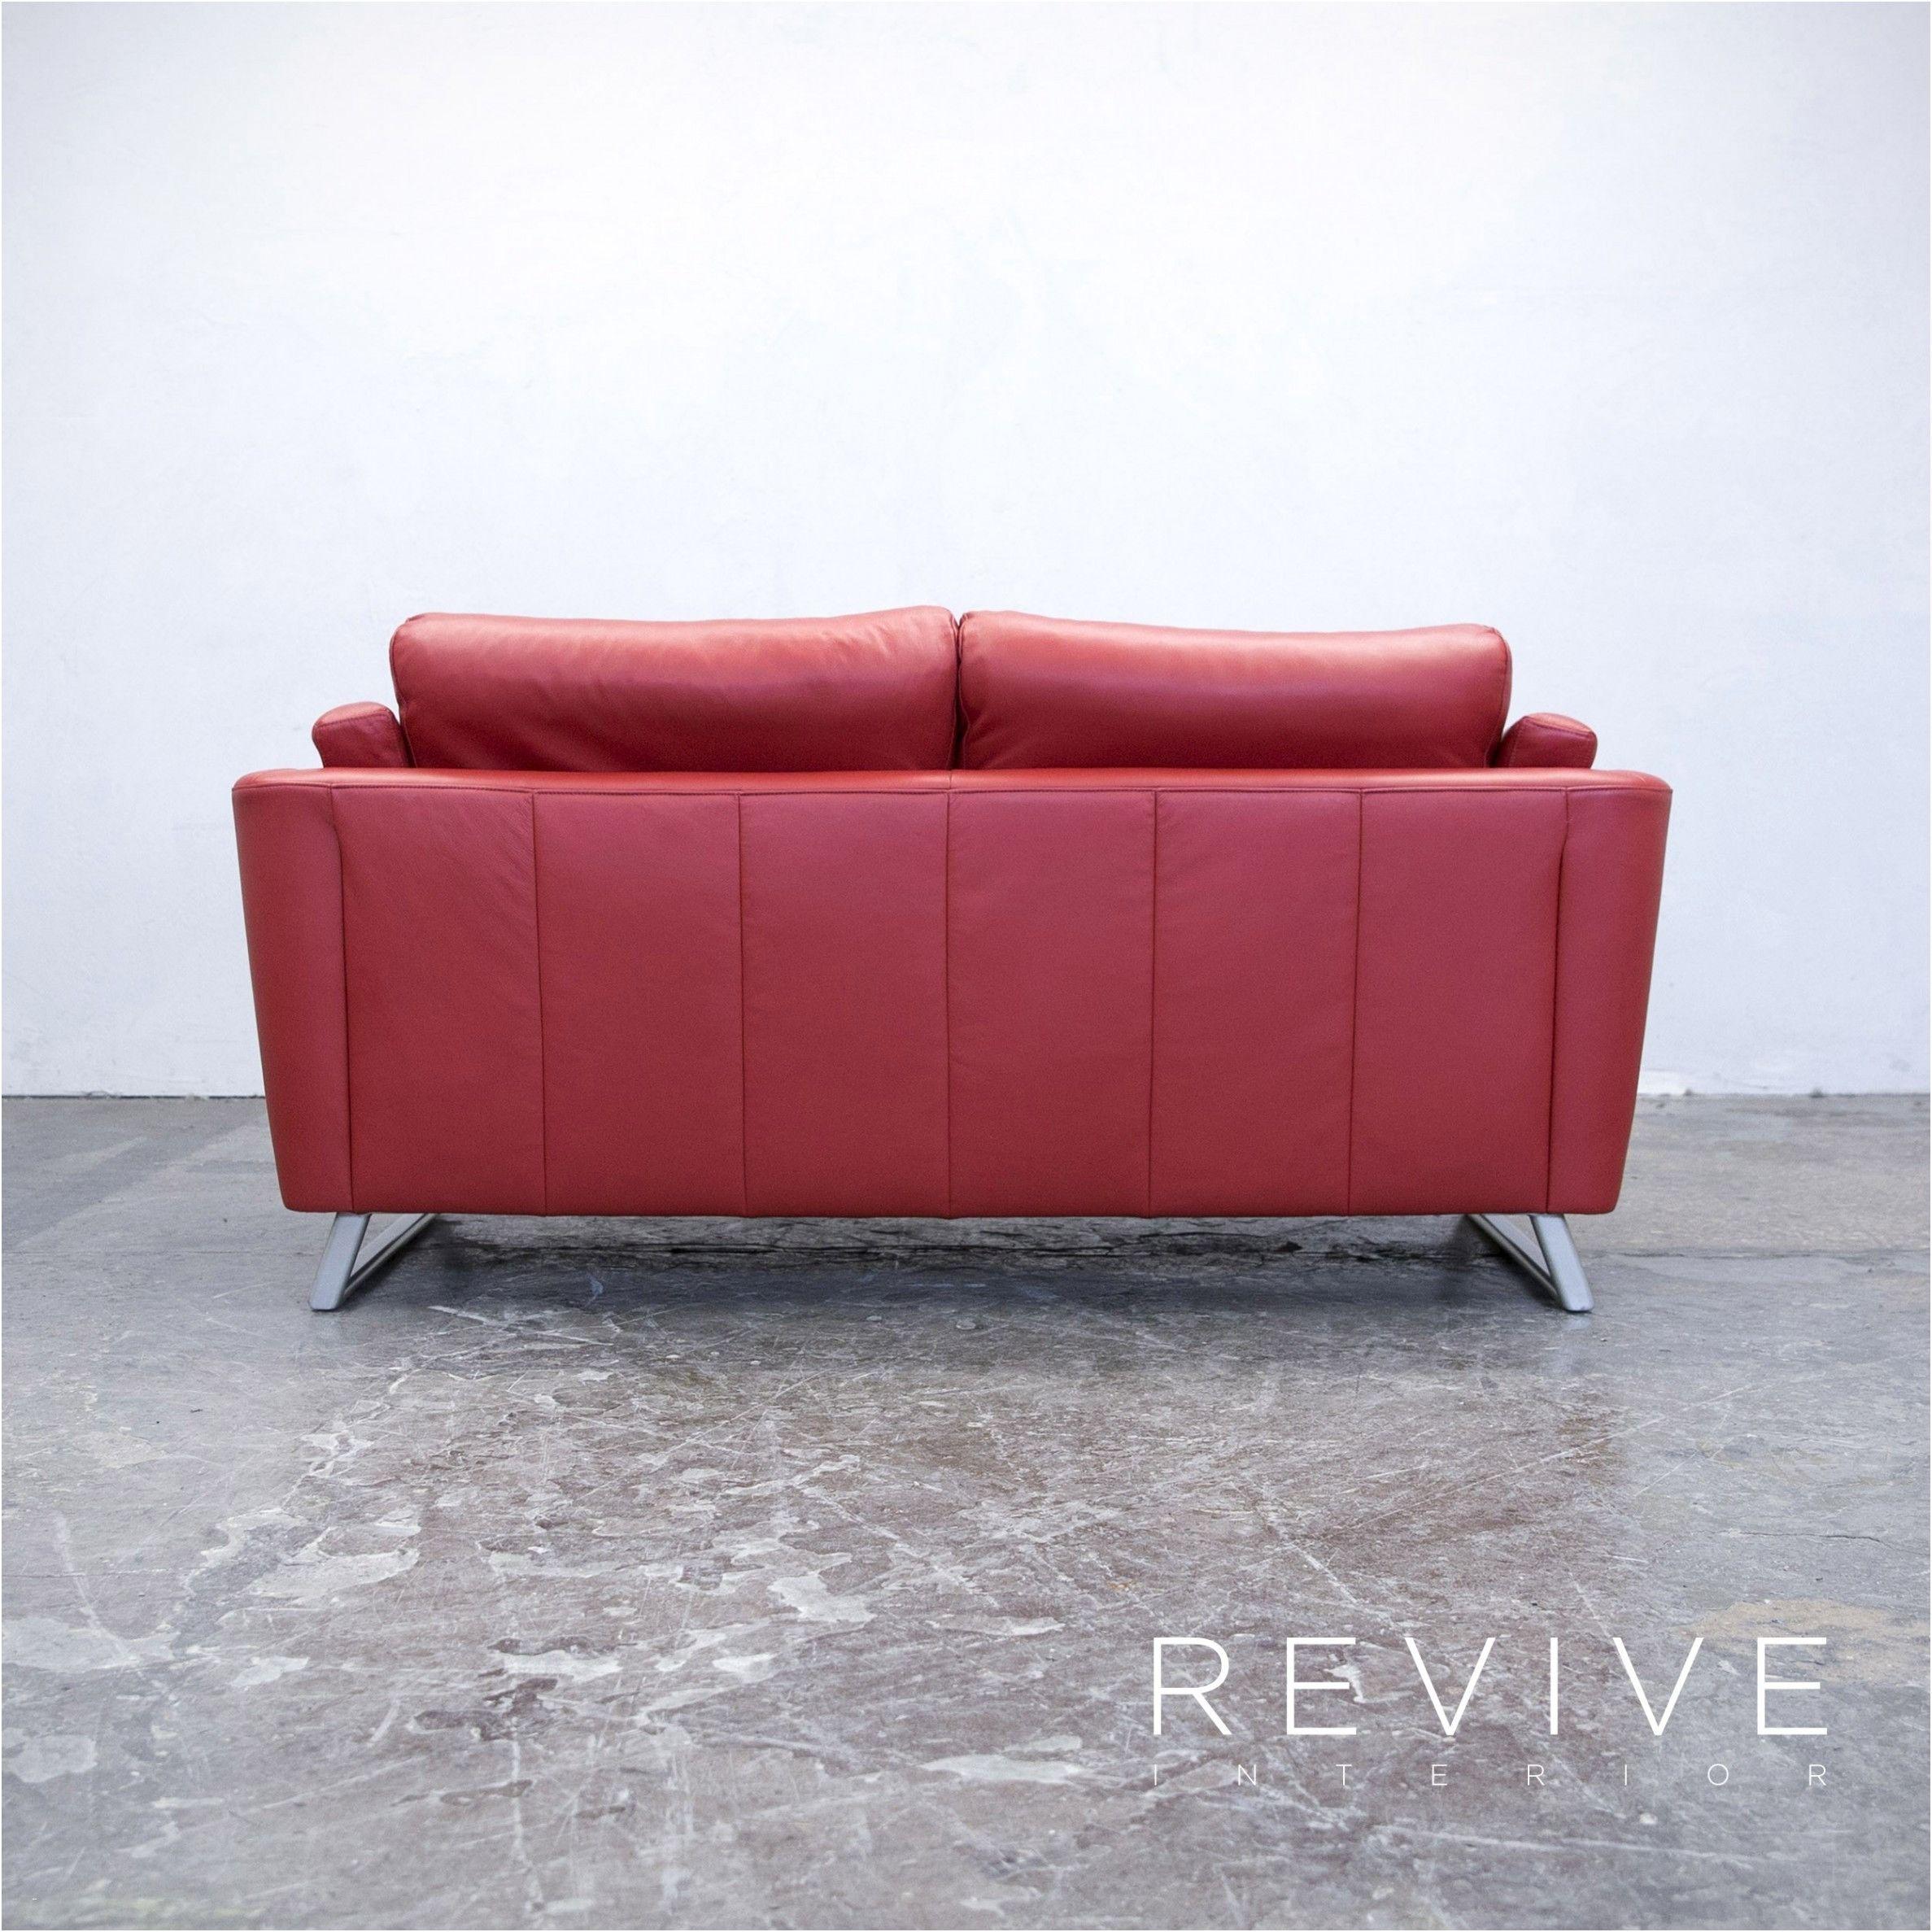 Sofa Dimension Beautiful Futon Ansprechend Samt Futon Sessel